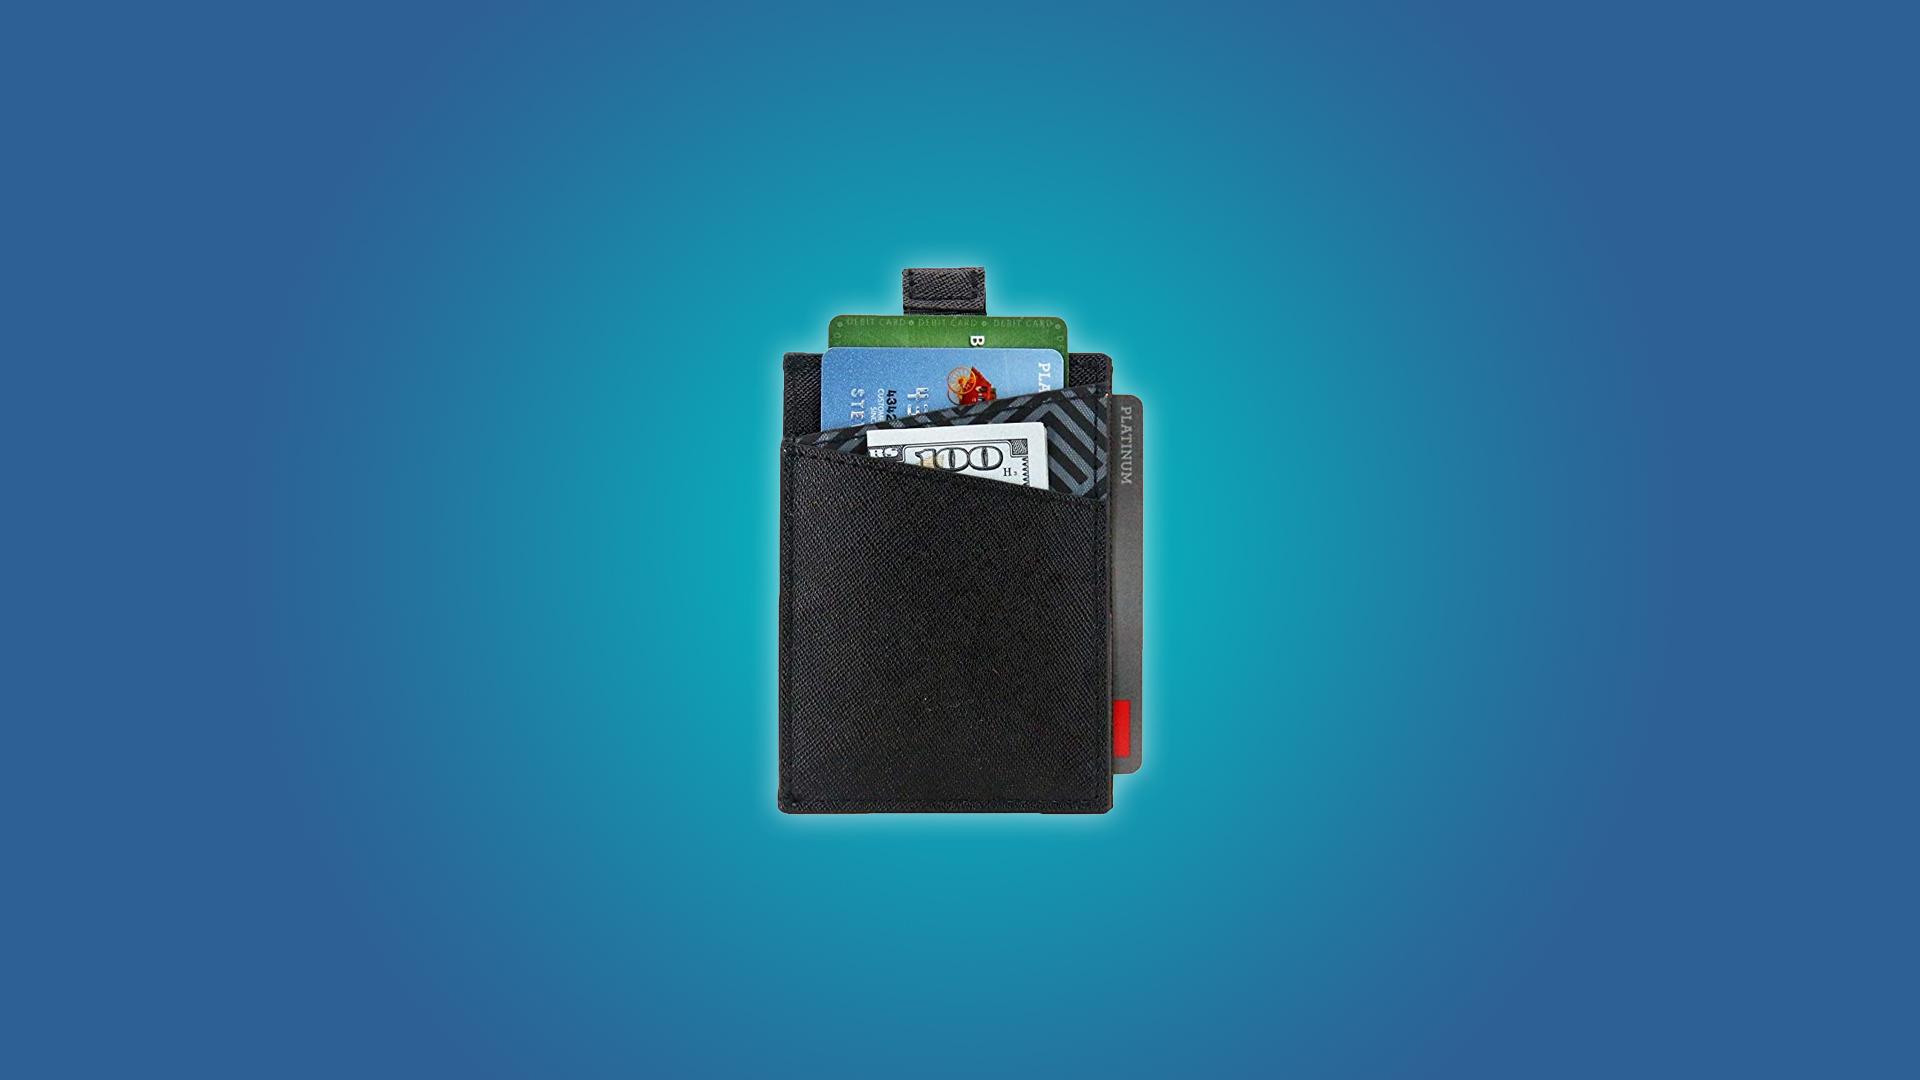 The Dash Vertical RFID Blocking Slim Wallet 5.0